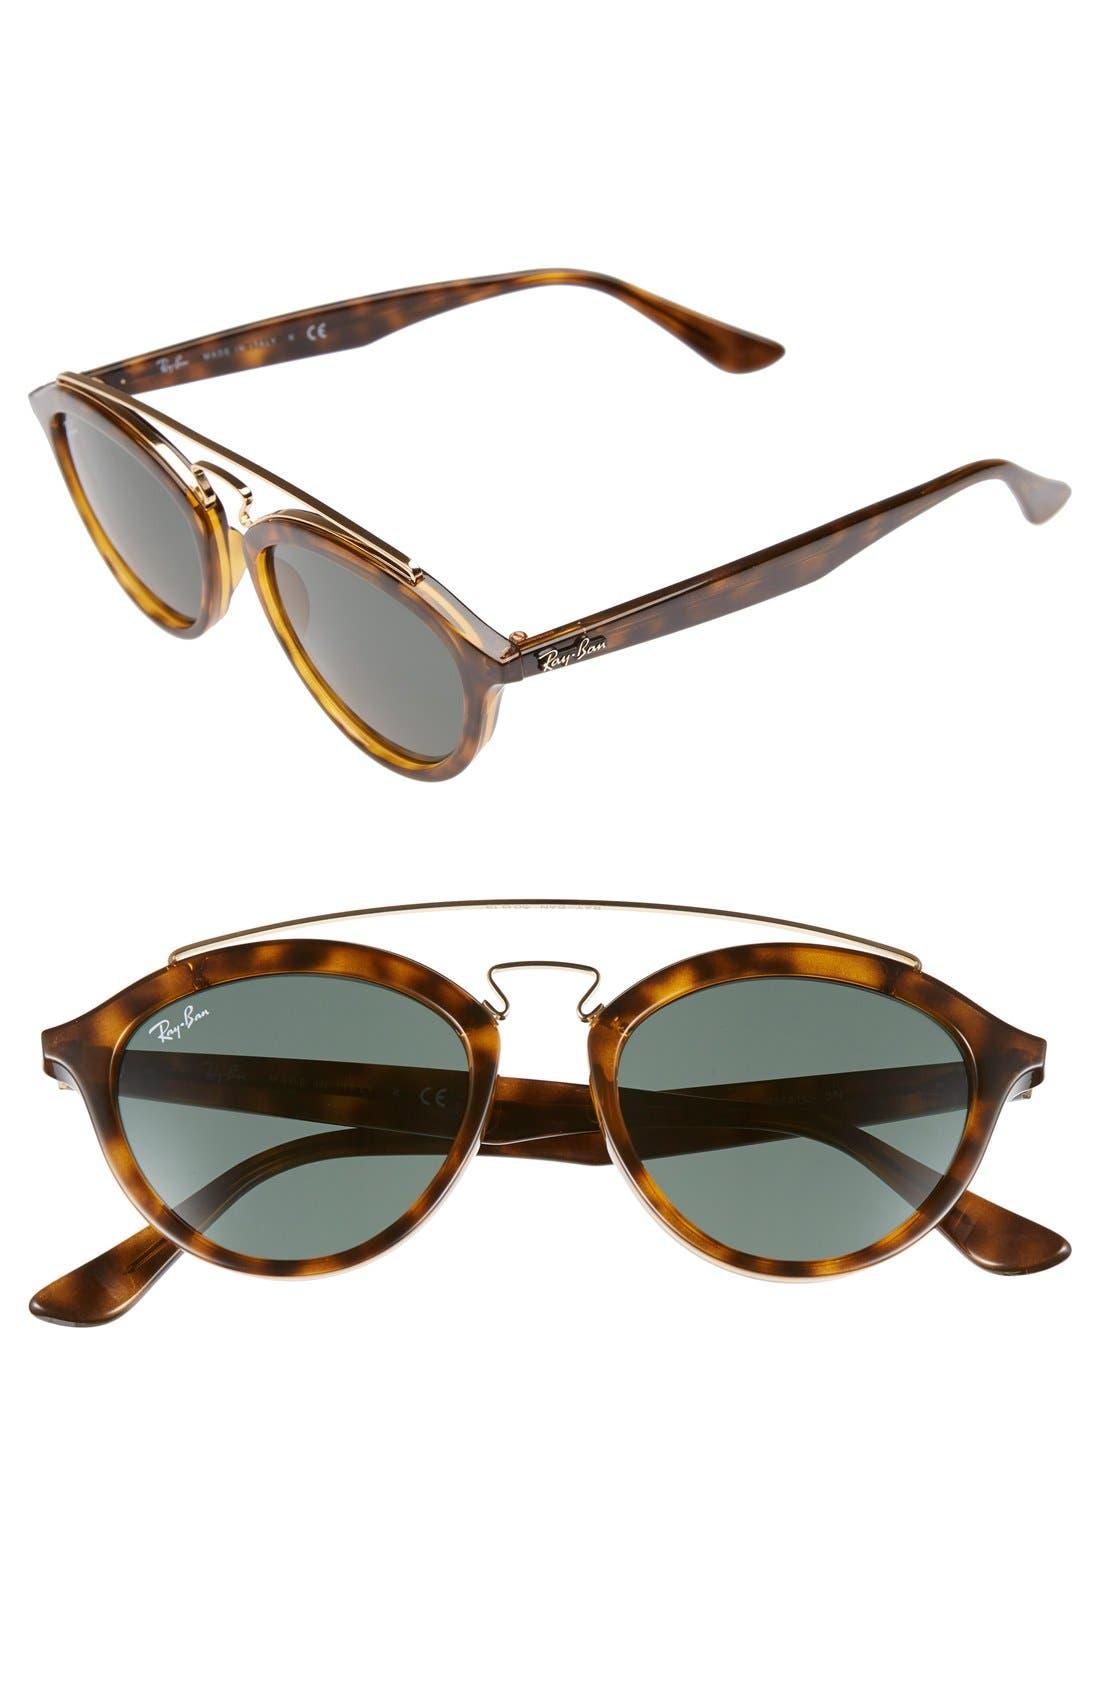 Main Image - Ray-Ban Highstreet 50mm Brow Bar Sunglasses